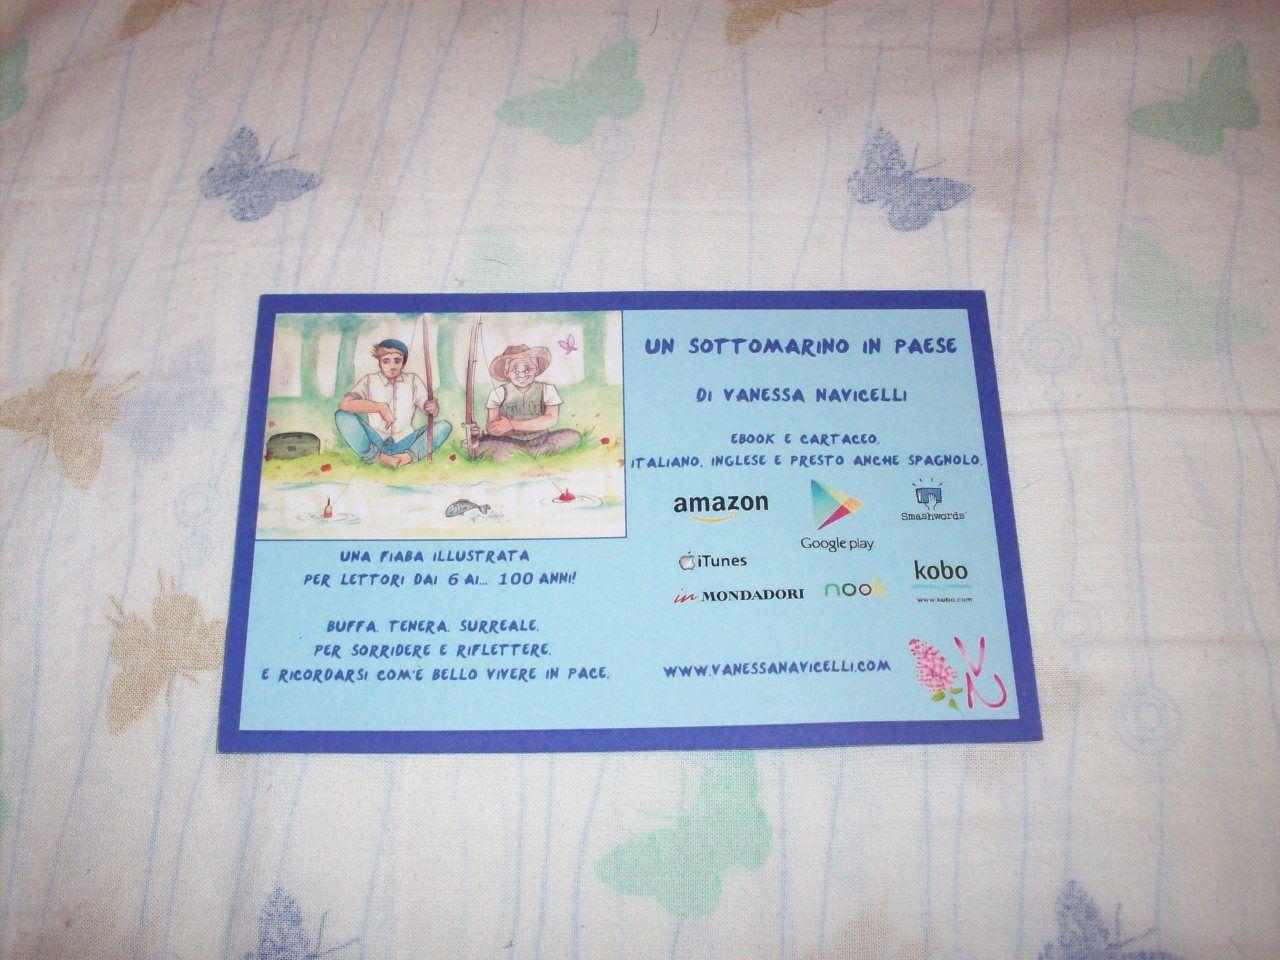 Retro cartolina de #UnSottomarinoInPaese